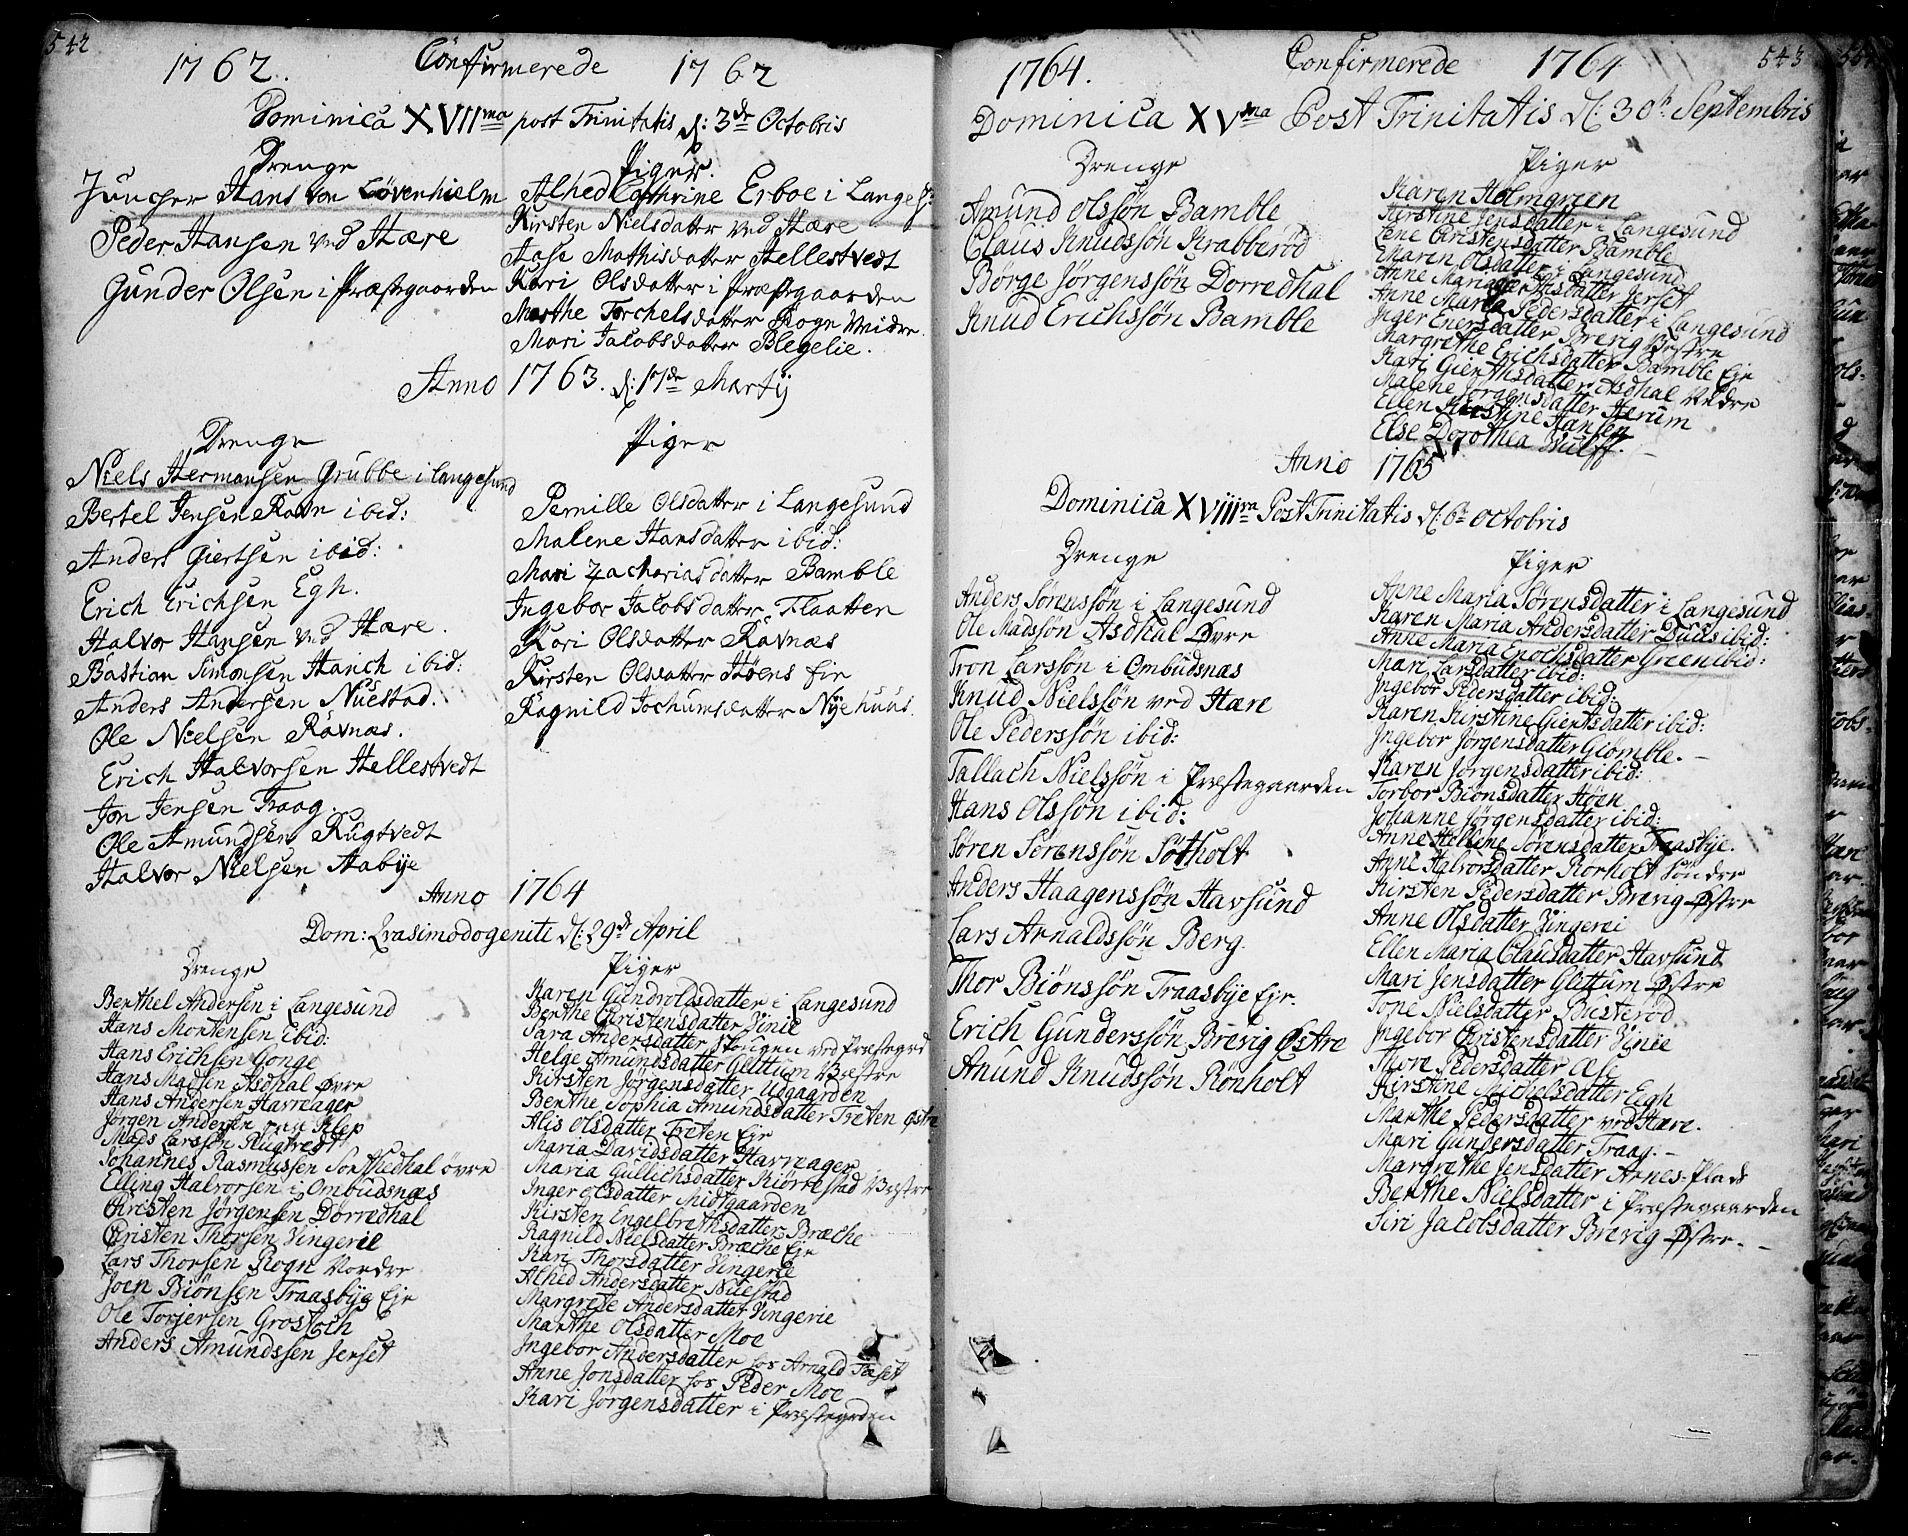 SAKO, Bamble kirkebøker, F/Fa/L0001: Ministerialbok nr. I 1, 1702-1774, s. 542-543